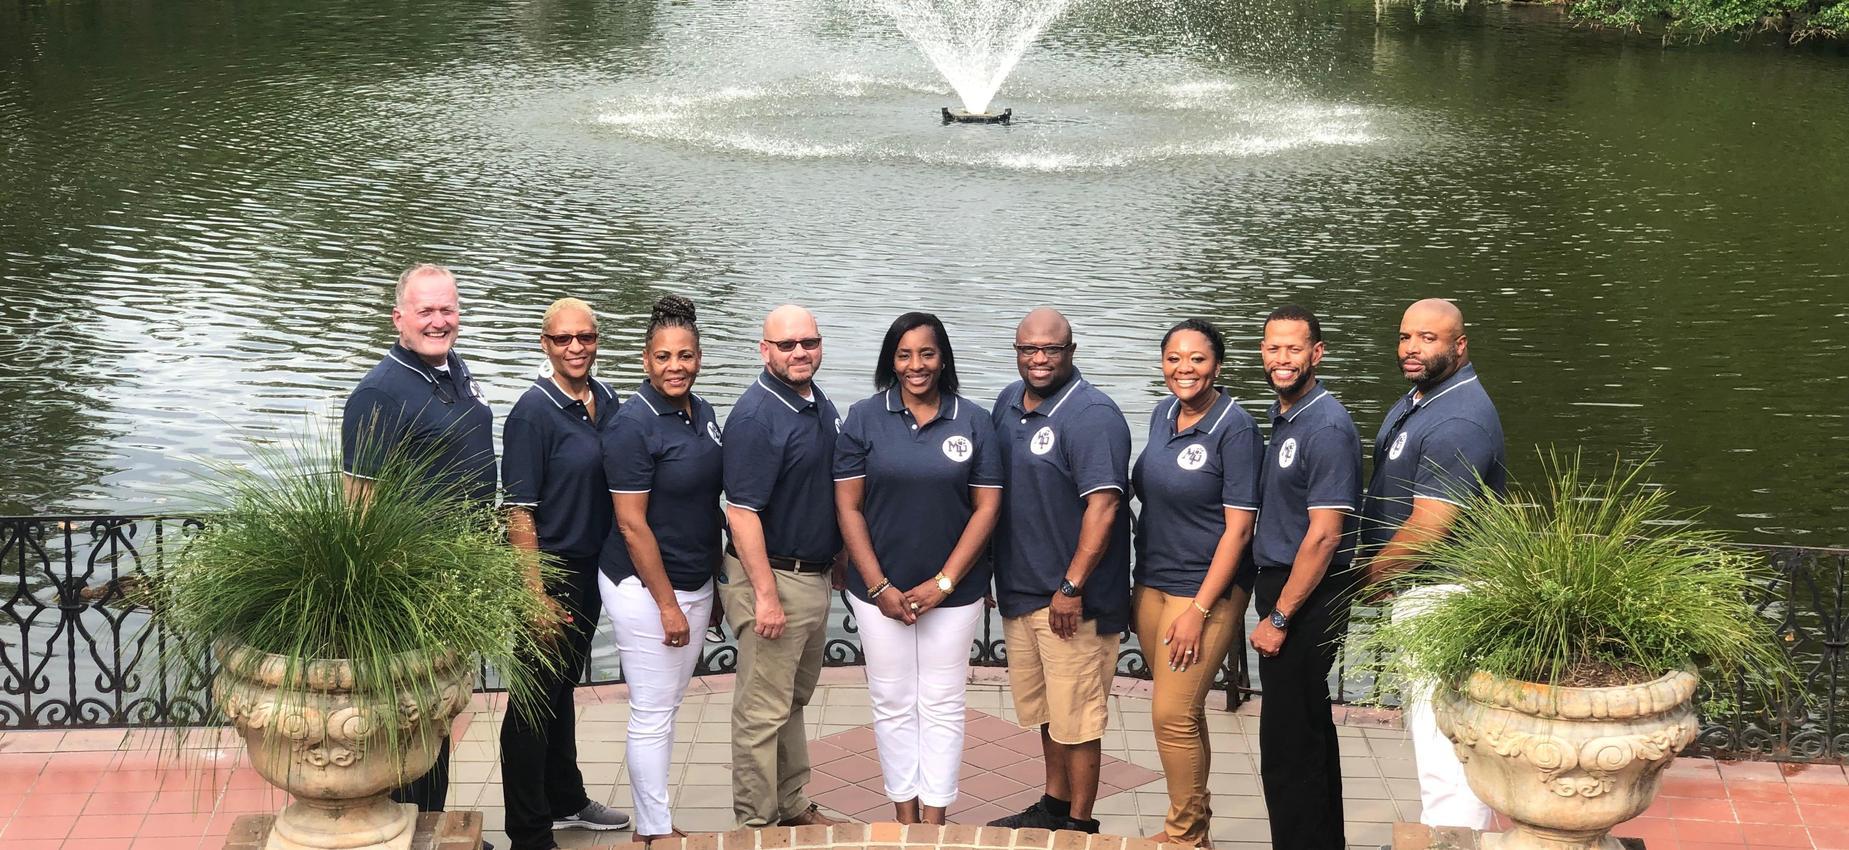 administrators group shot